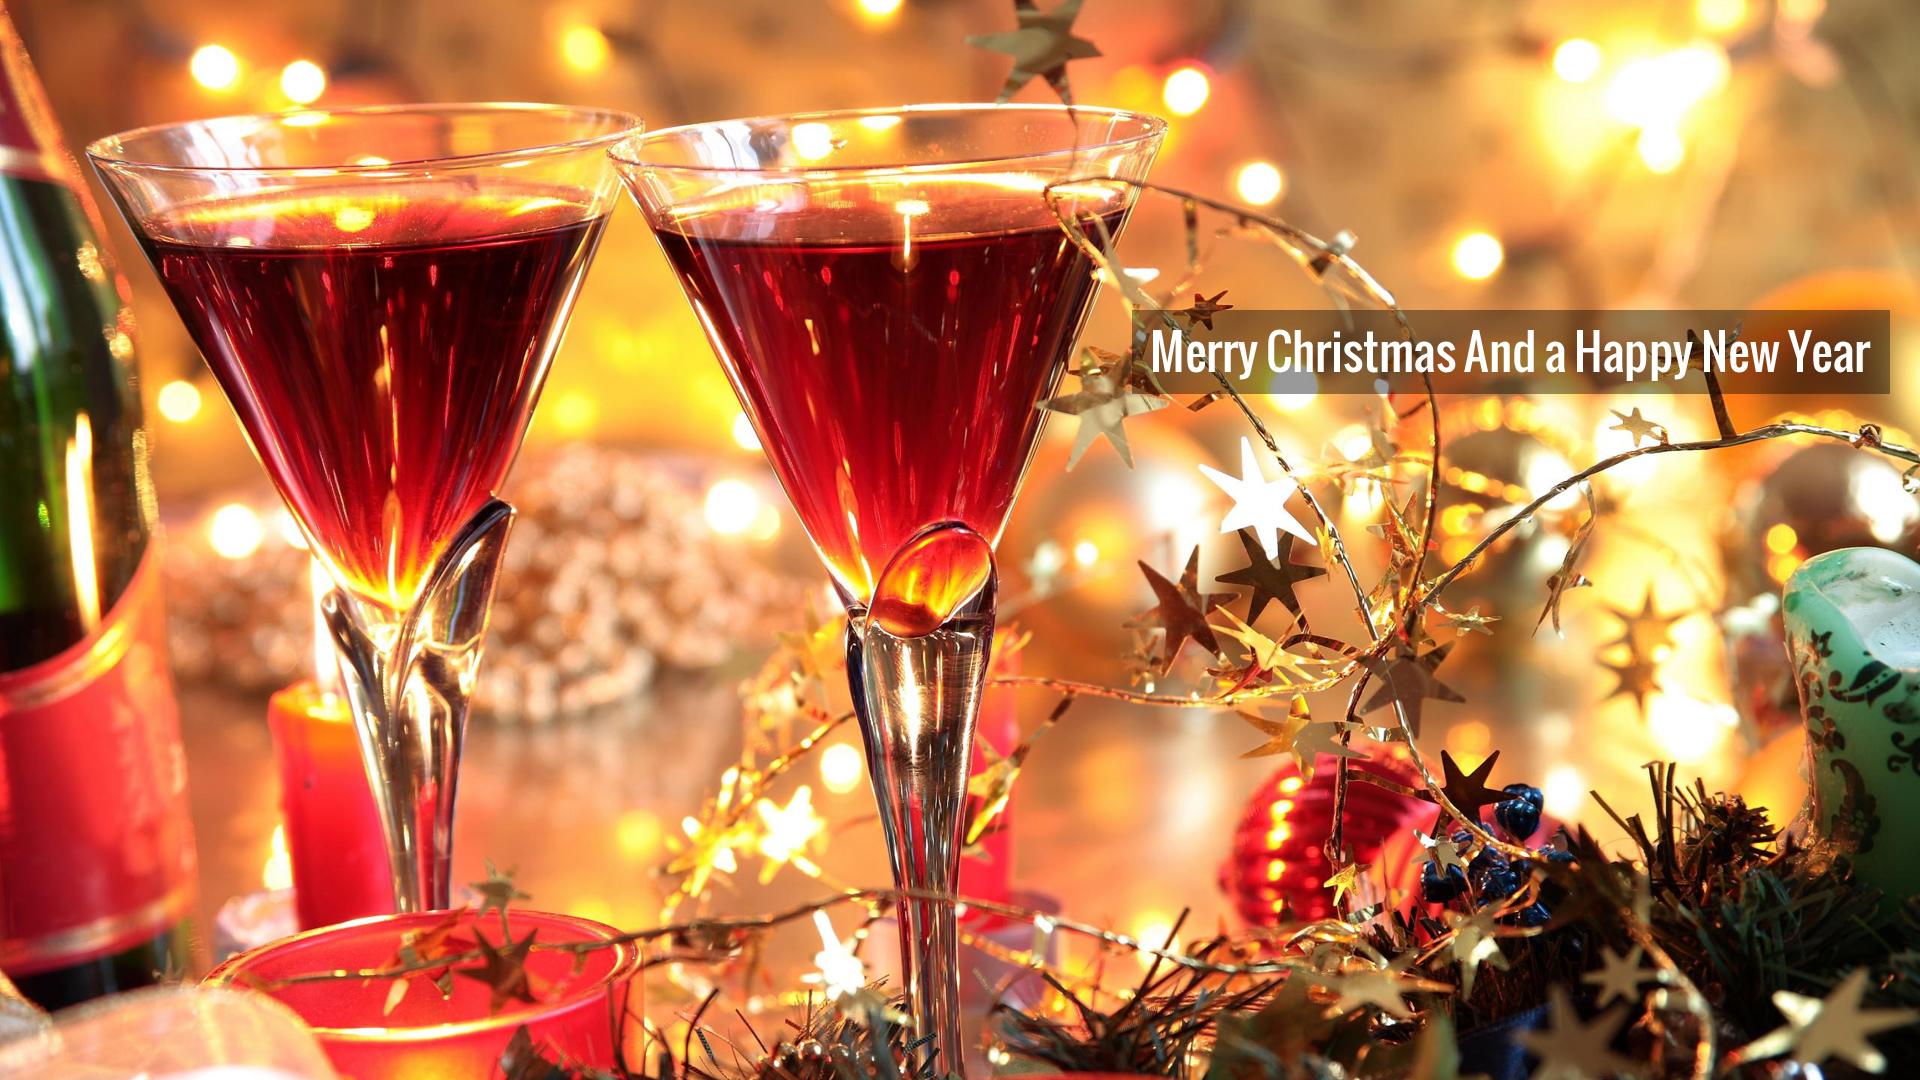 Christmas Wallpapers Hd 1080p: Christmas Wallpapers HD 1080p